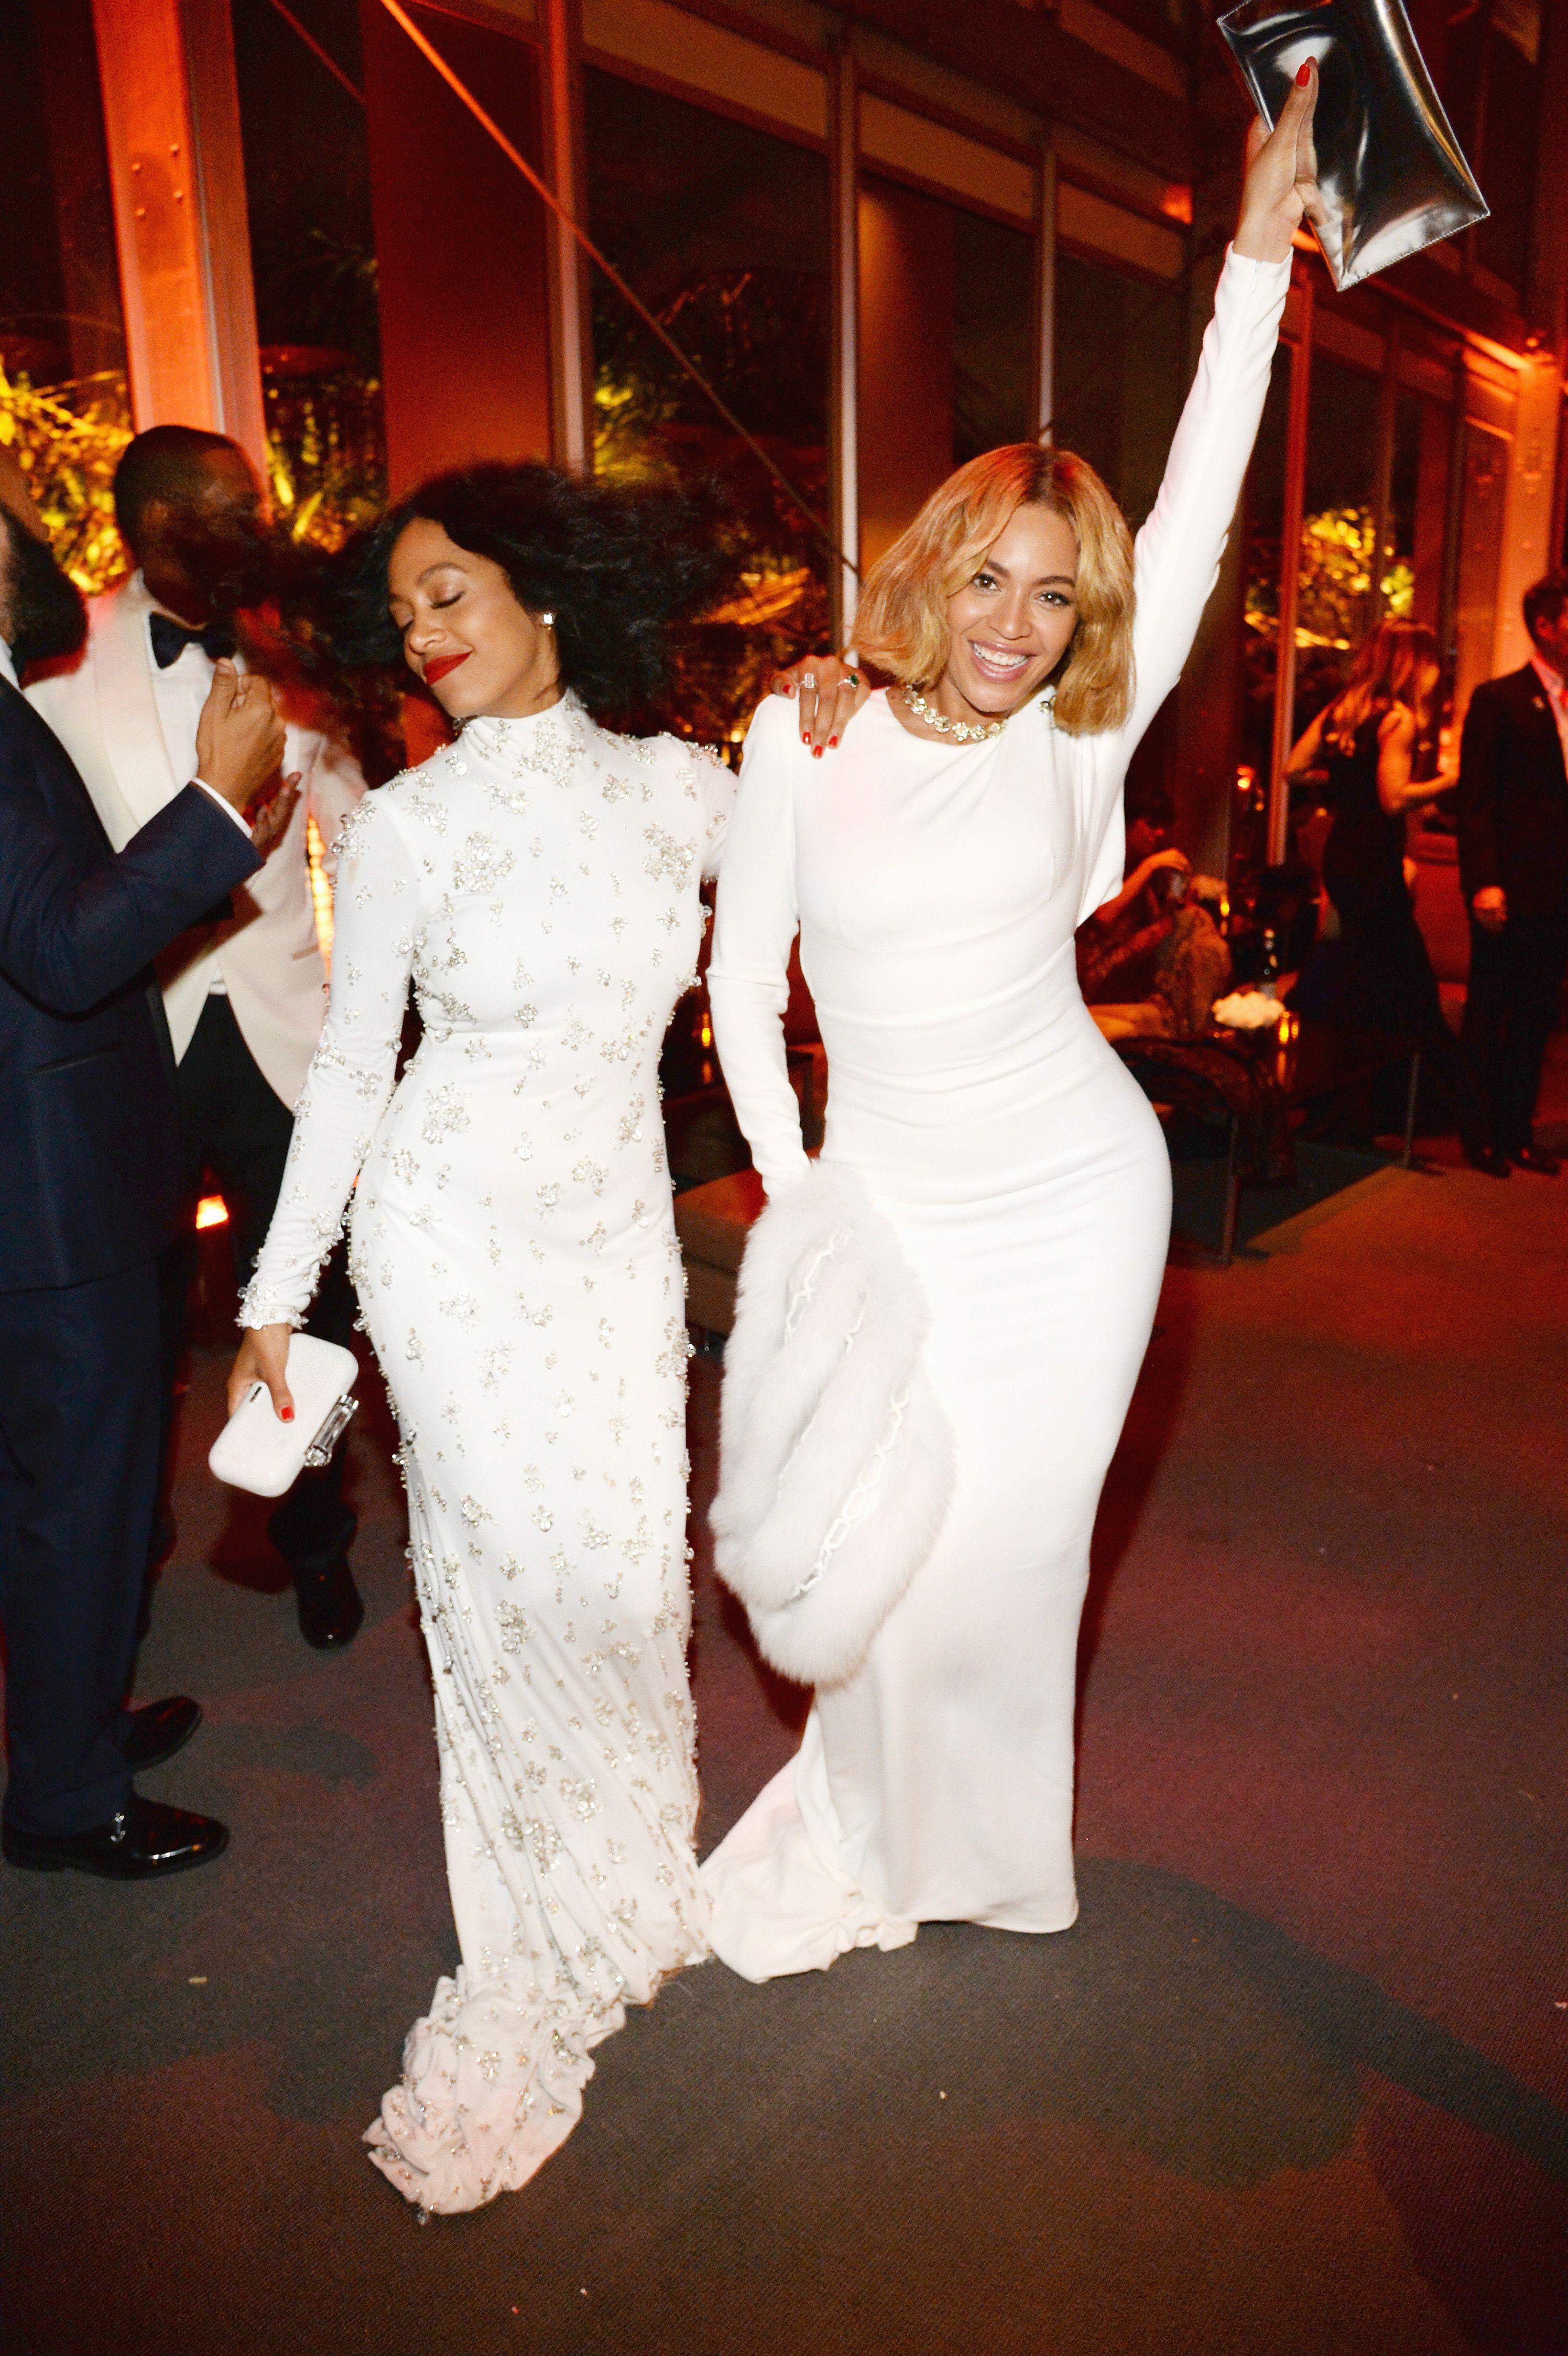 de27d8f64dc So Cute  Beyoncé and Solange Wear Matching Dresses to Oscars Party via   WhoWhatWear